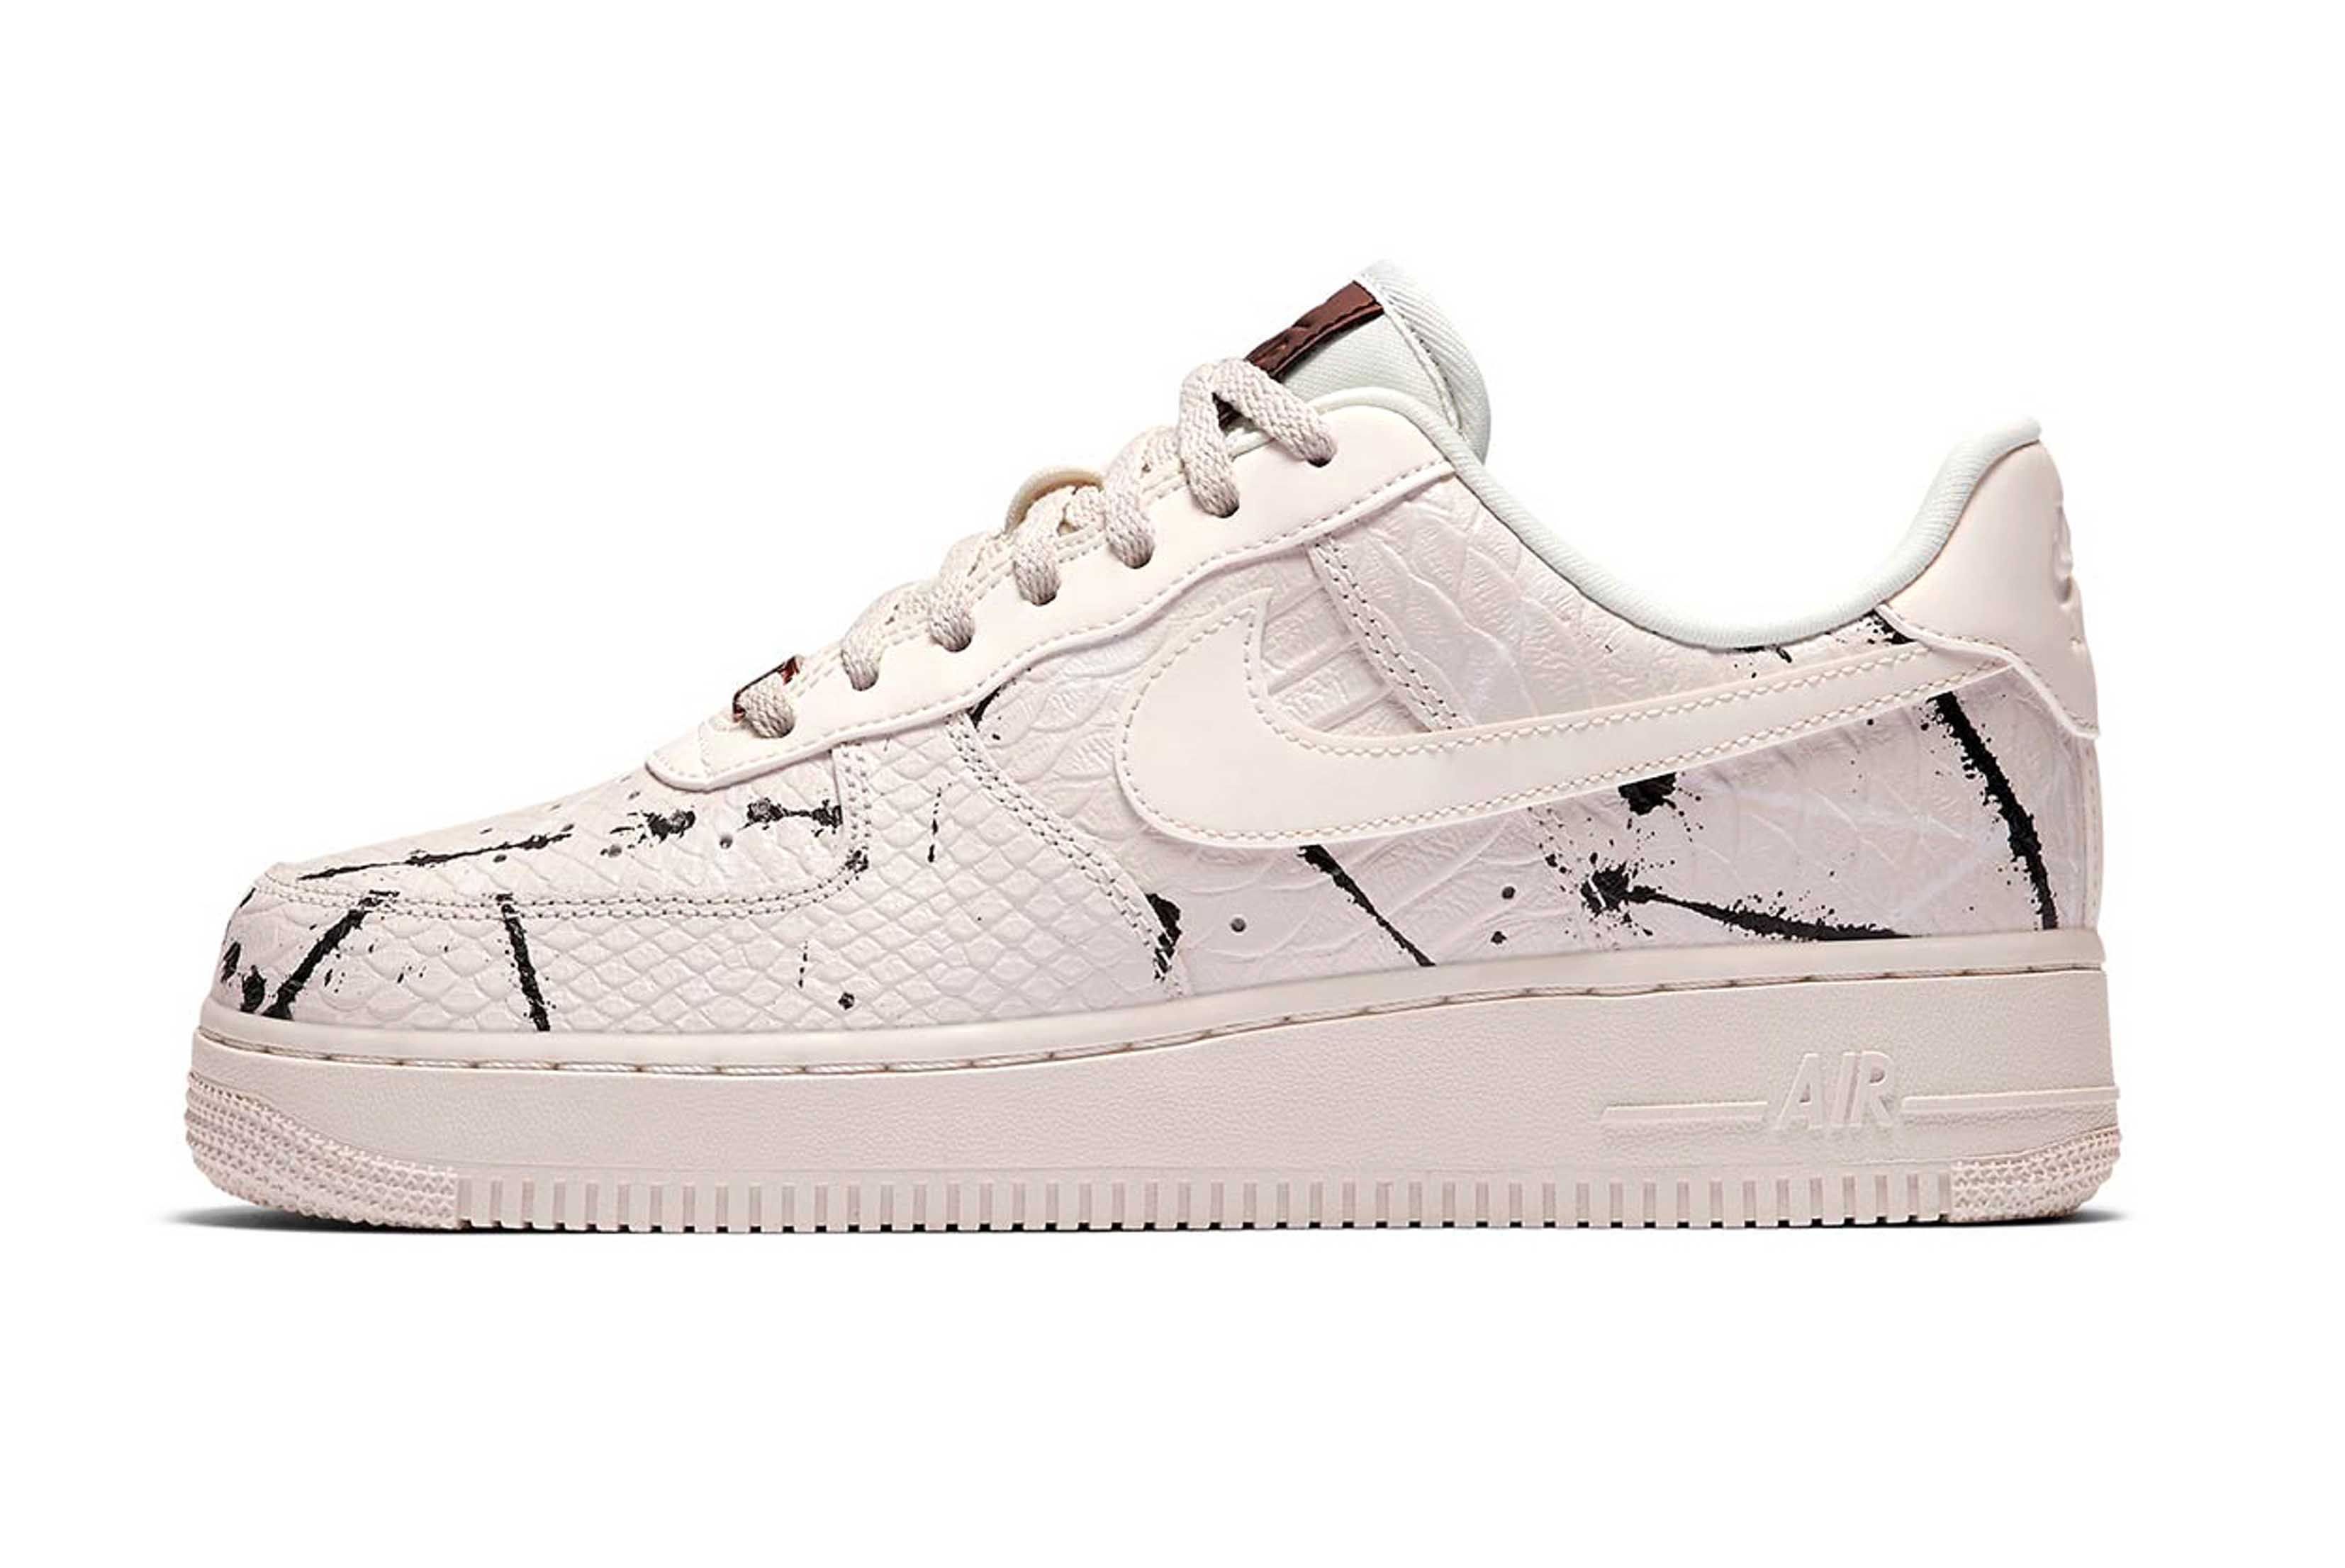 Nike Air Force 1 Low Phantom Snakeskin Release 1 Sneaker Freaker